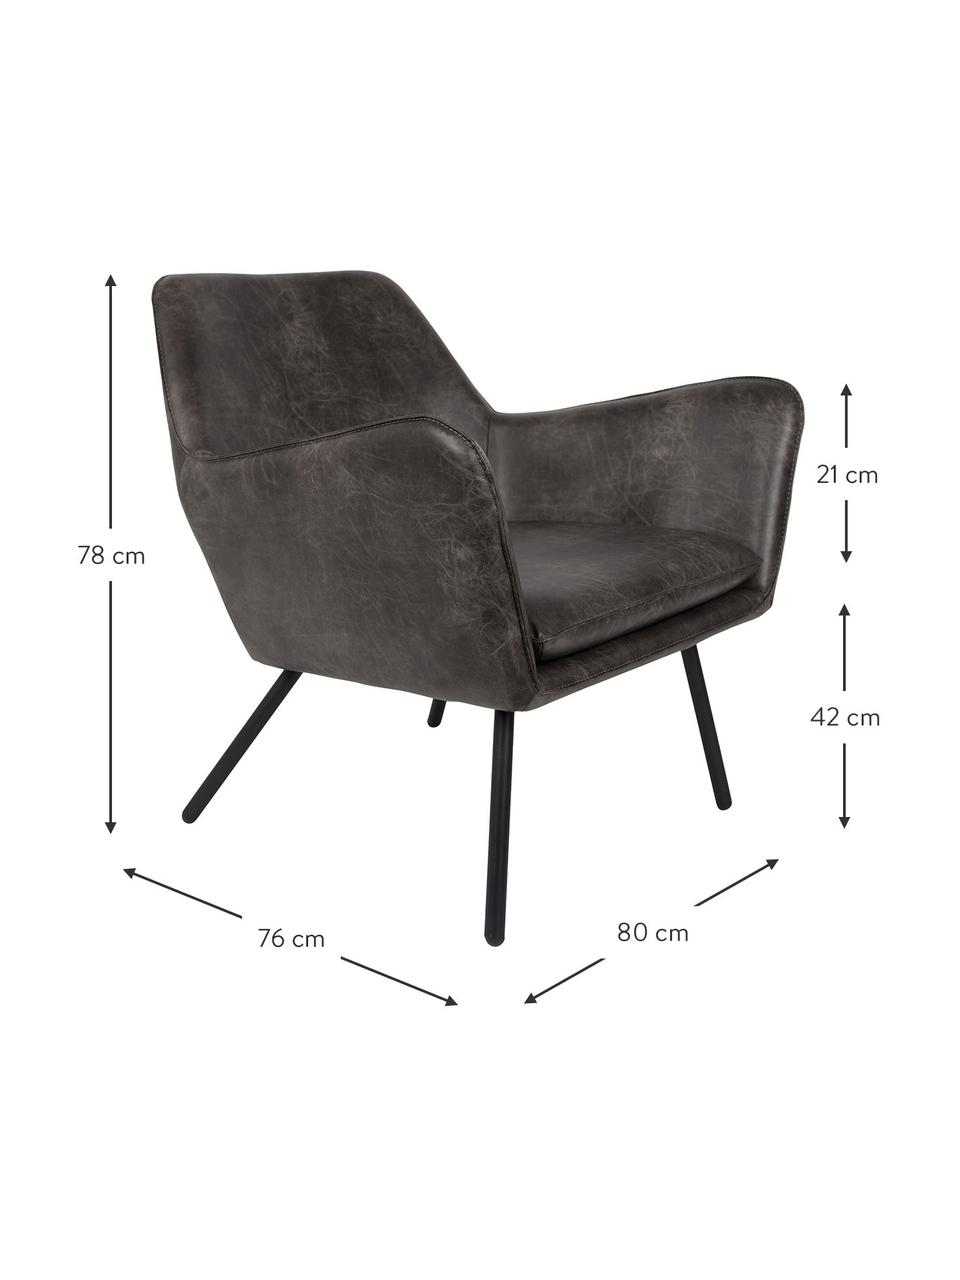 Kunstleder-Loungesessel Bon im Industrial Design, Bezug: Kunstleder (64% Polyureth, Füße: Metall, lackiert, Kunstleder Dunkelgrau, B 80 x T 76 cm